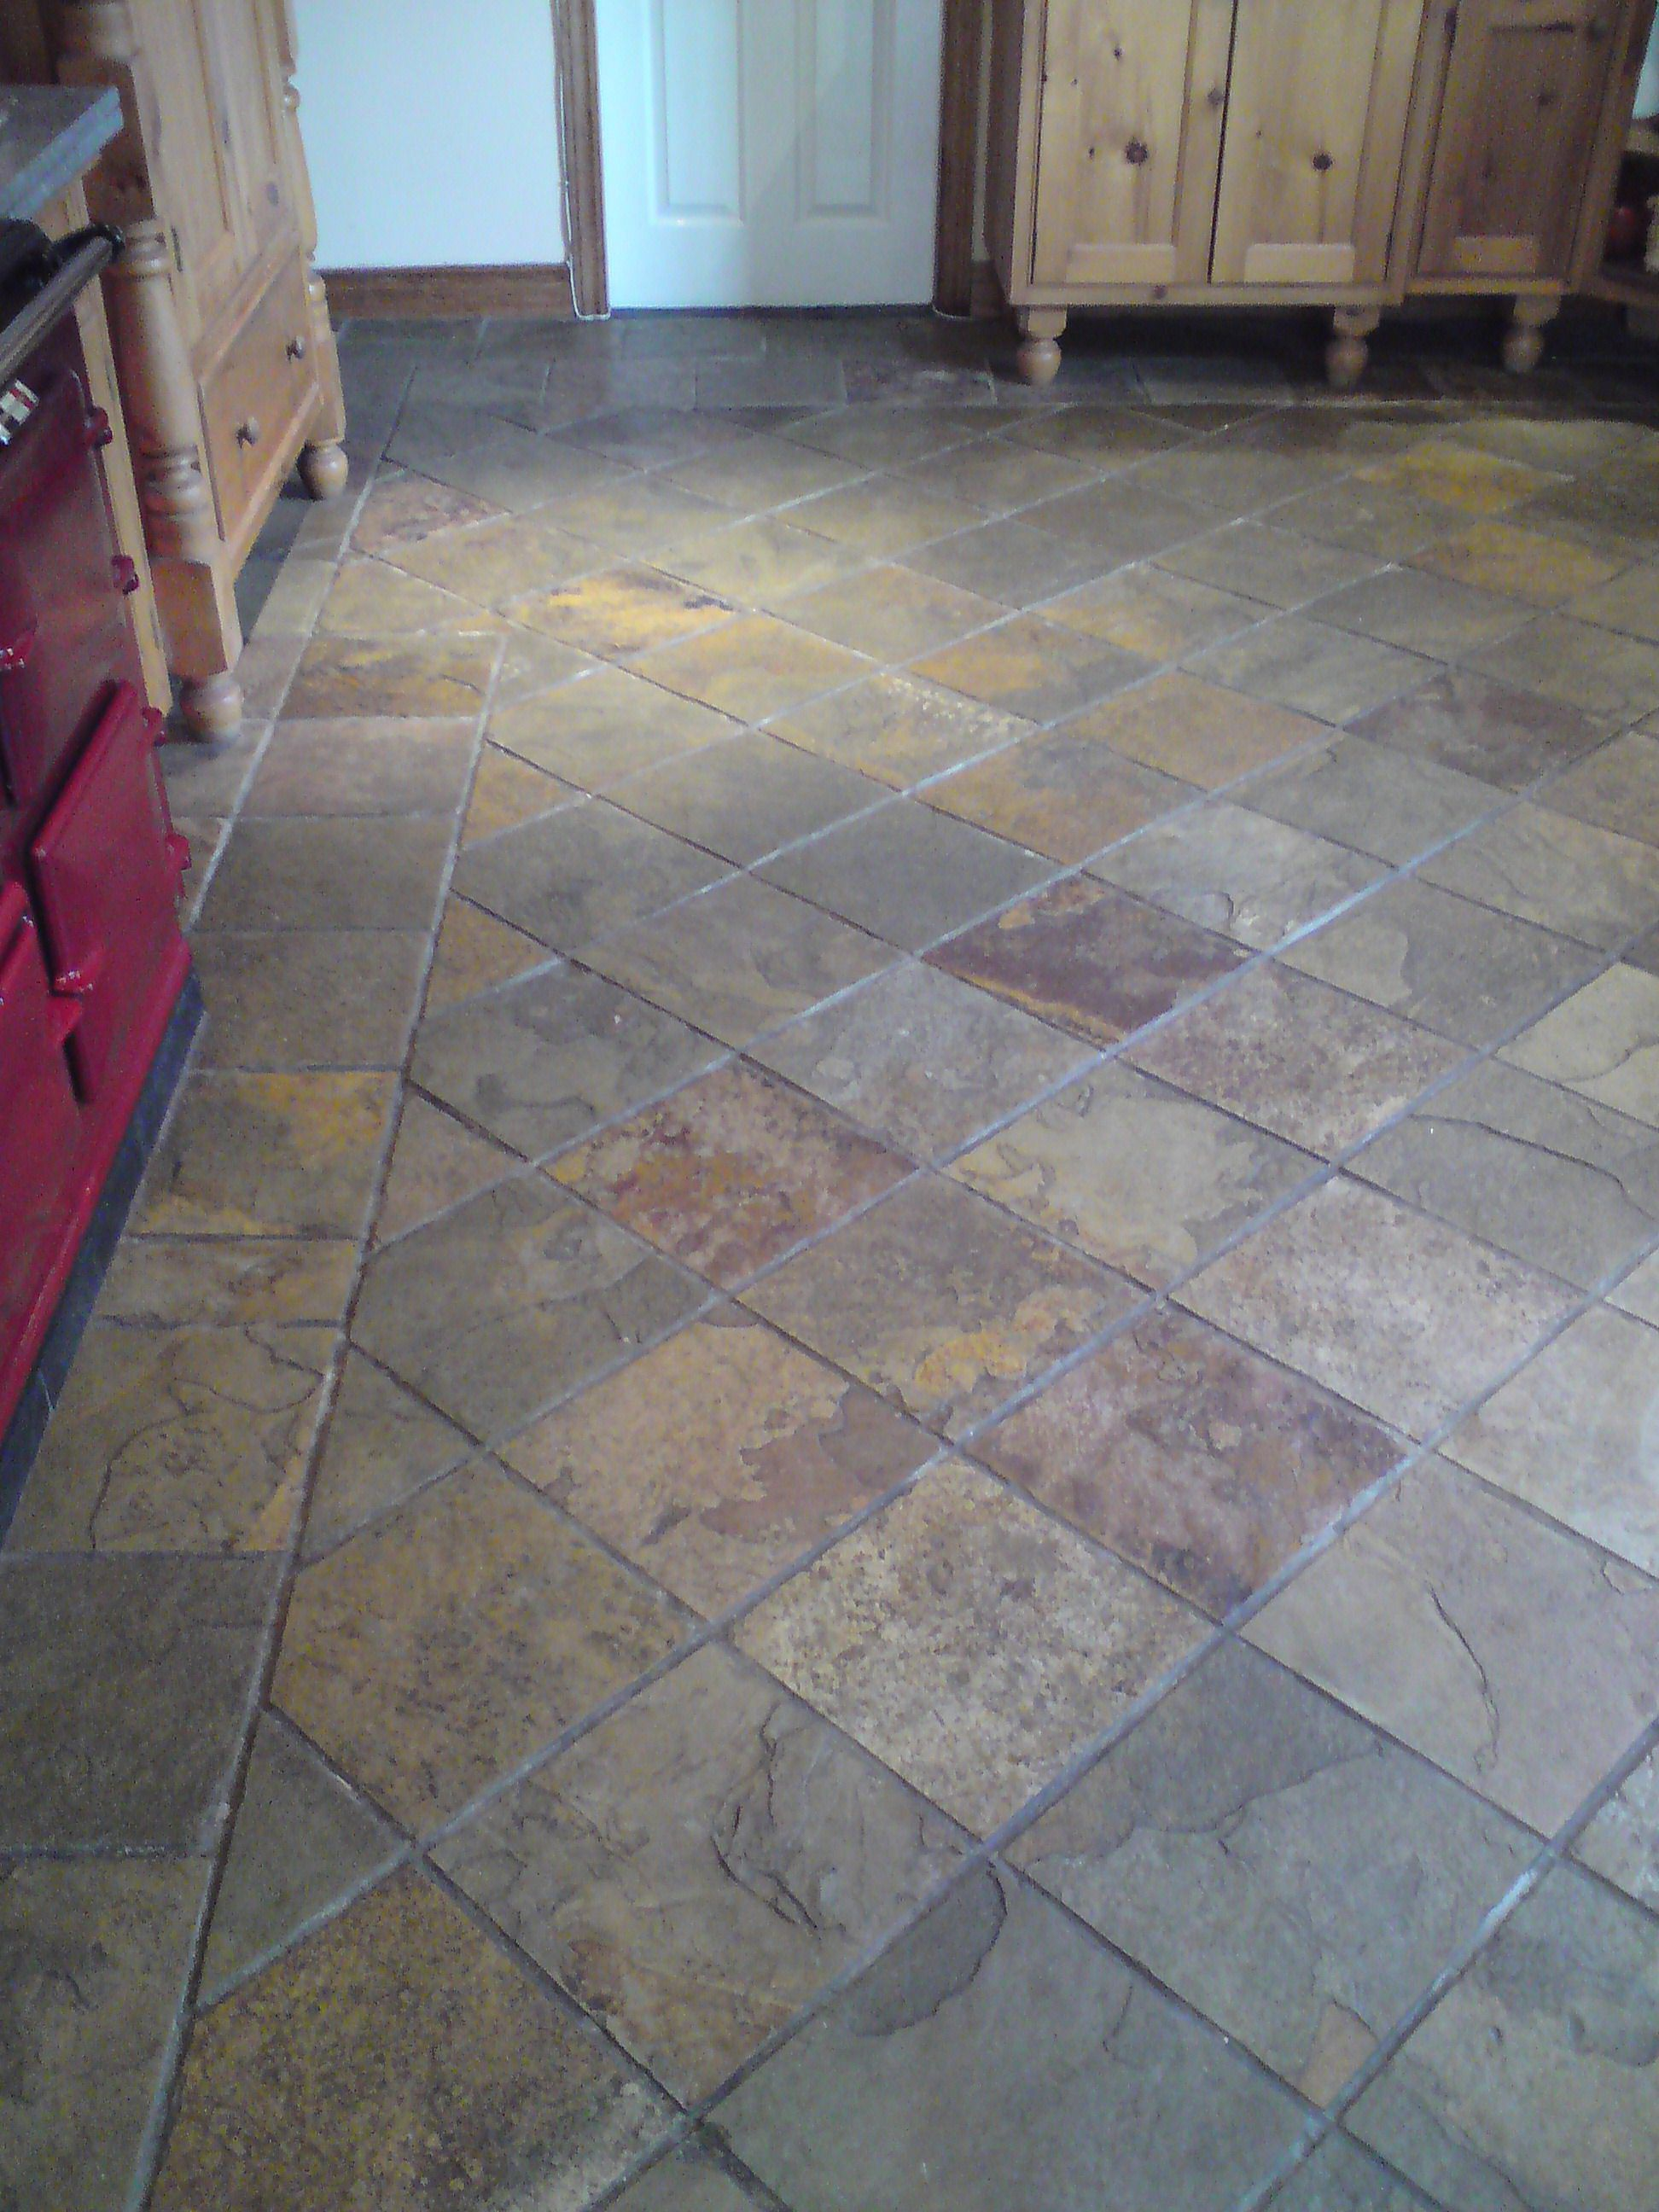 Accessories Furniture Fascinating Natural Stone Floor Tile With Slate Tile Meshed Back Pattern Best Inspiring N Stone Tile Flooring Stone Flooring Tile Floor